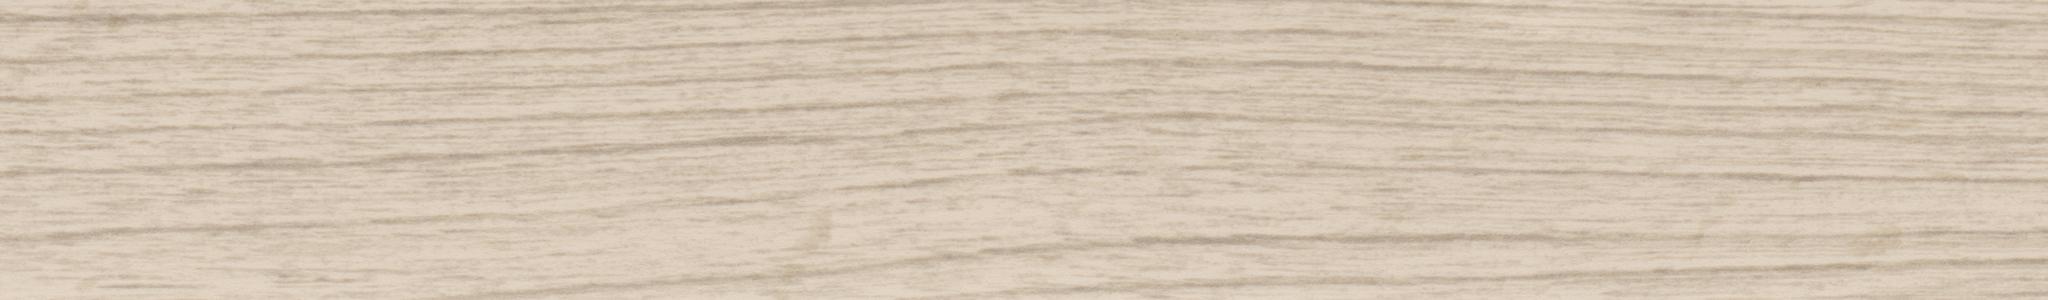 HD 255573 ABS Edge Sand Pine Smooth Softmatt